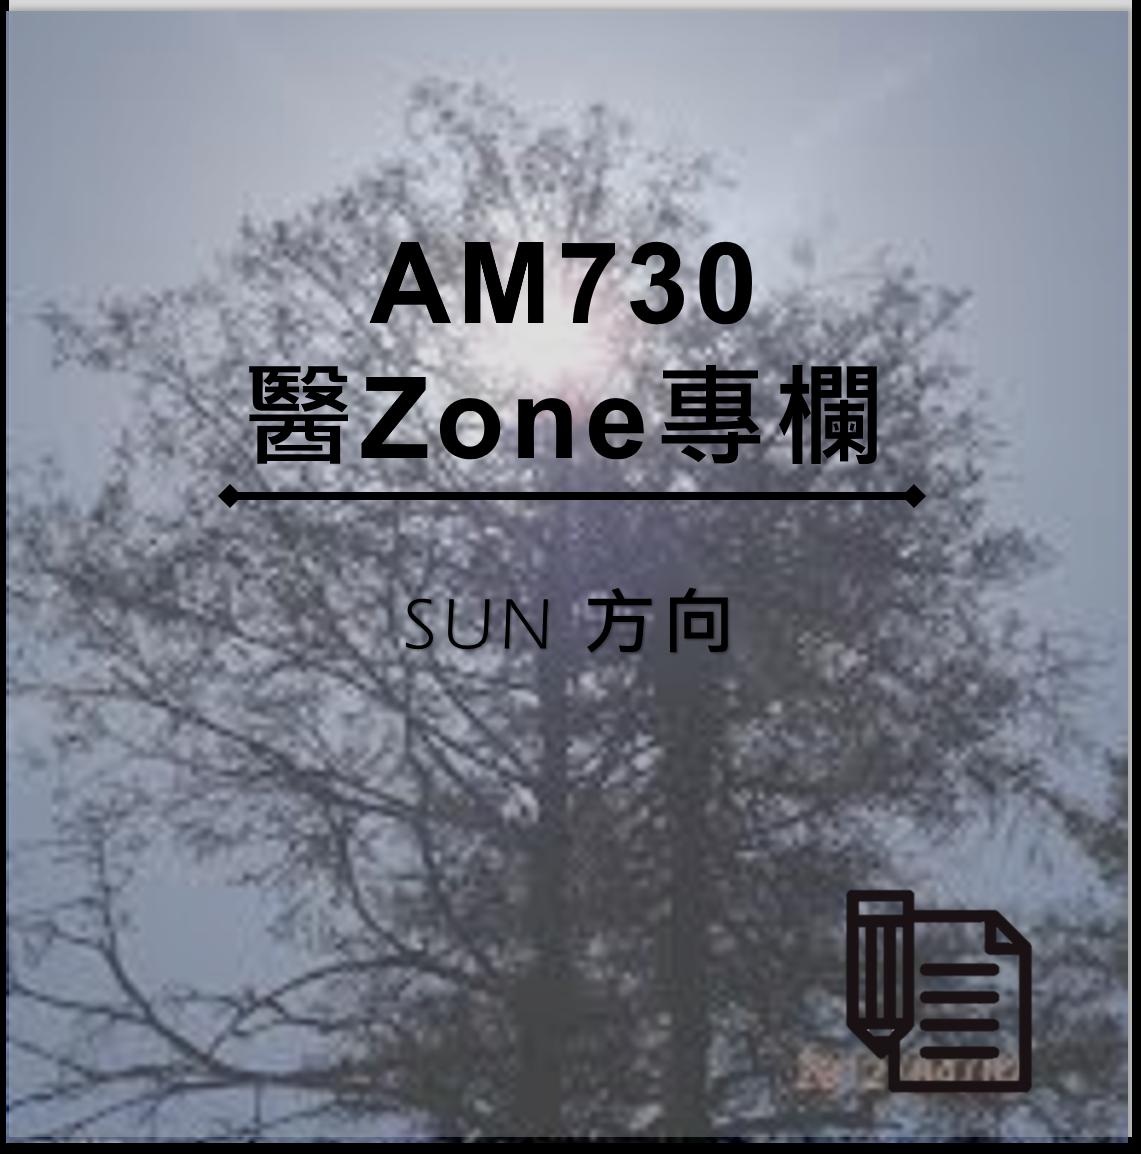 AM730 醫Zone 專欄 - SUN 方向